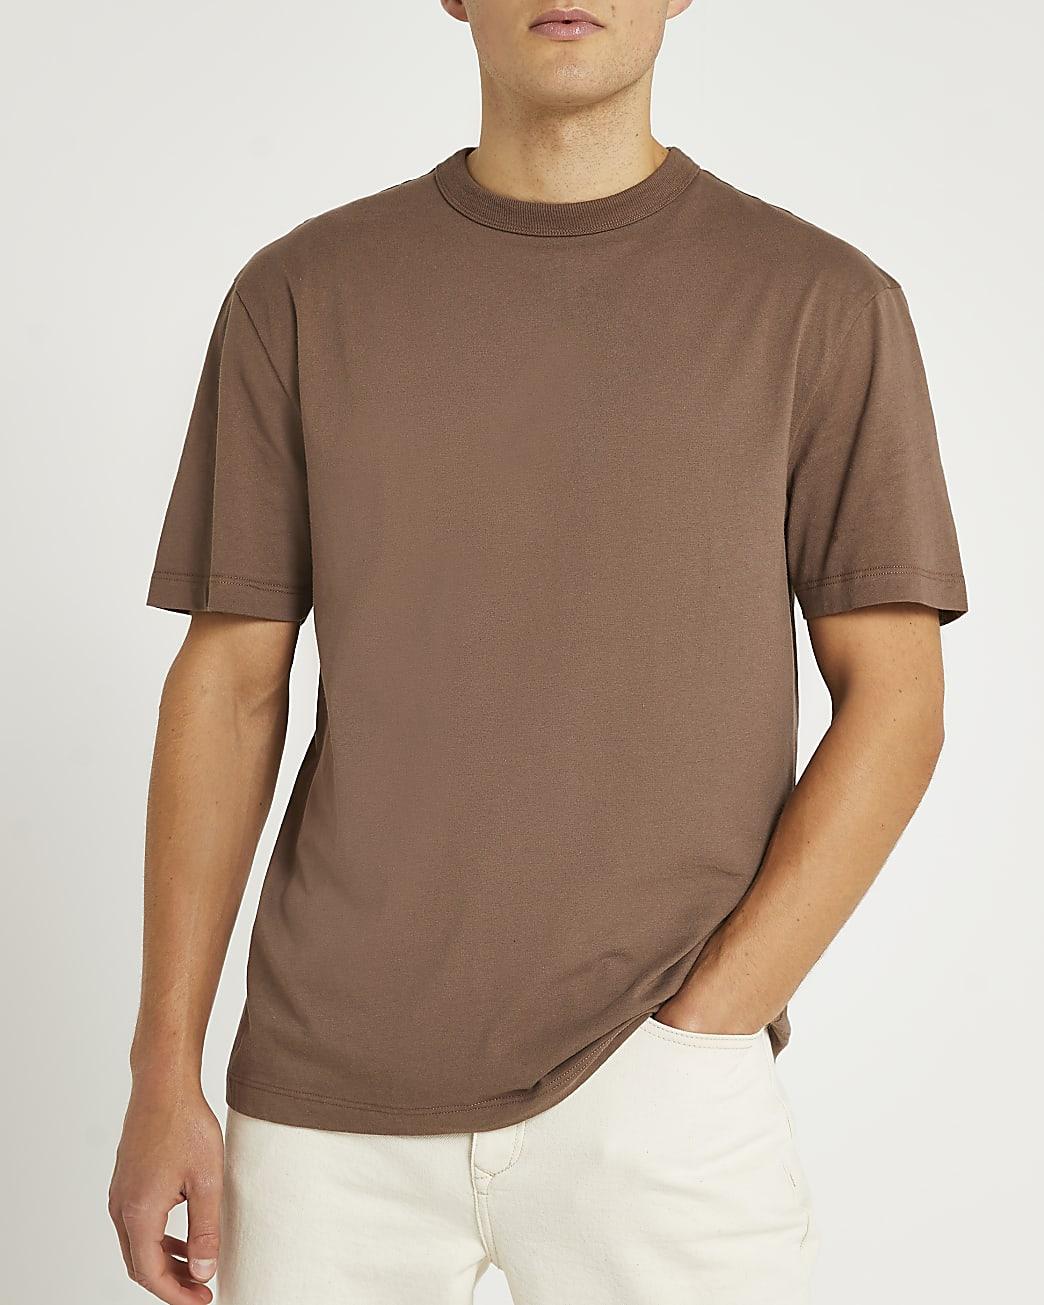 Brown regular fit t-shirt